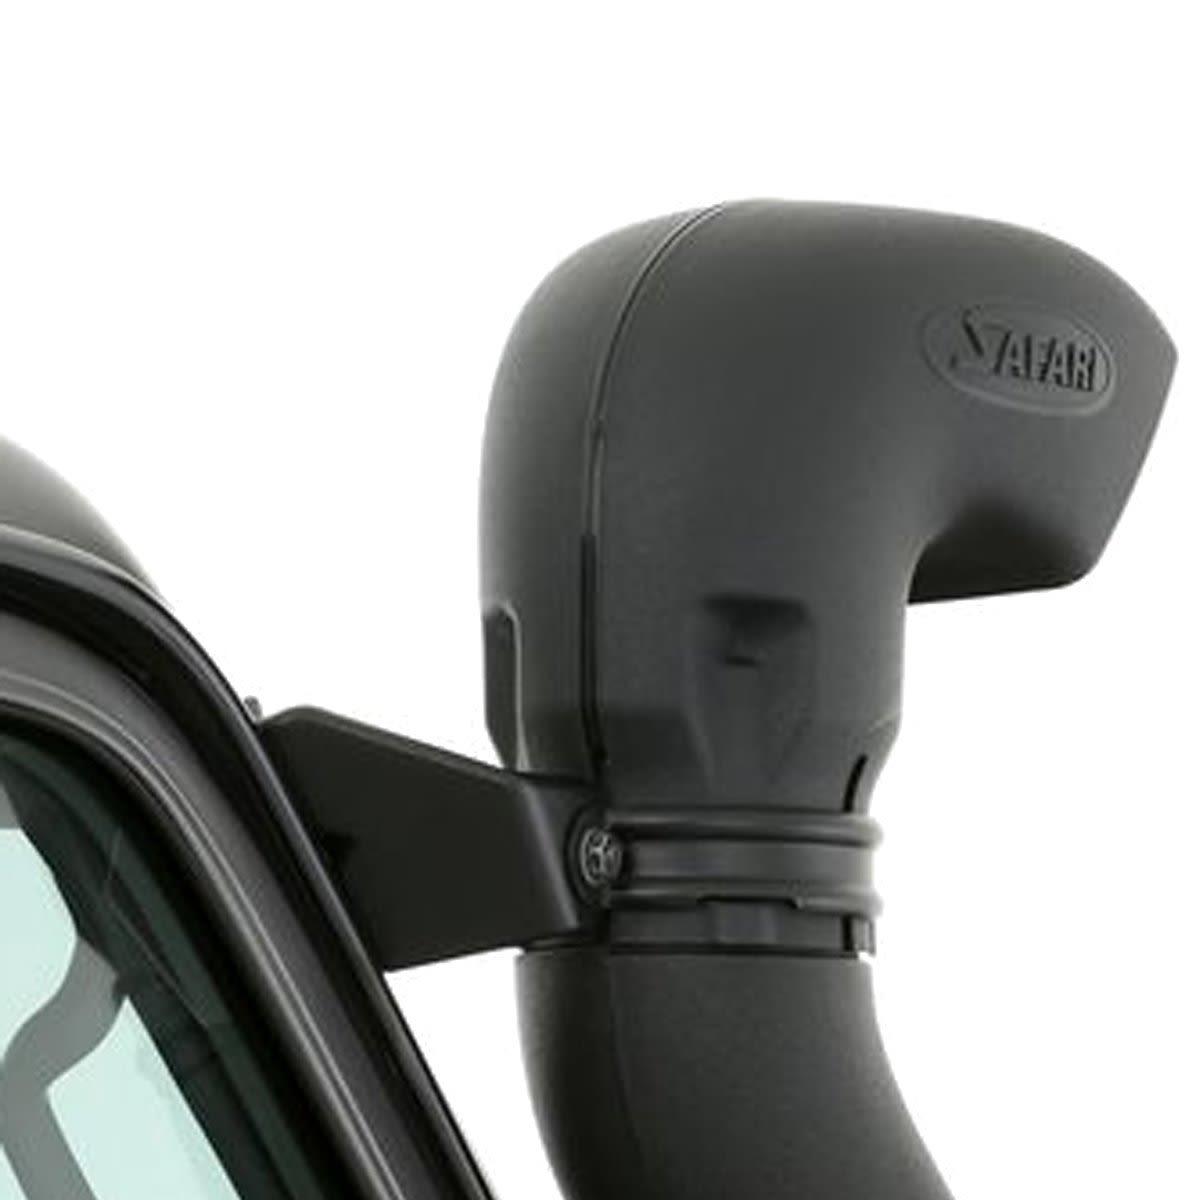 Safari ARMAX Snorkel to suit Toyota Landcruiser (01/2007 - on)